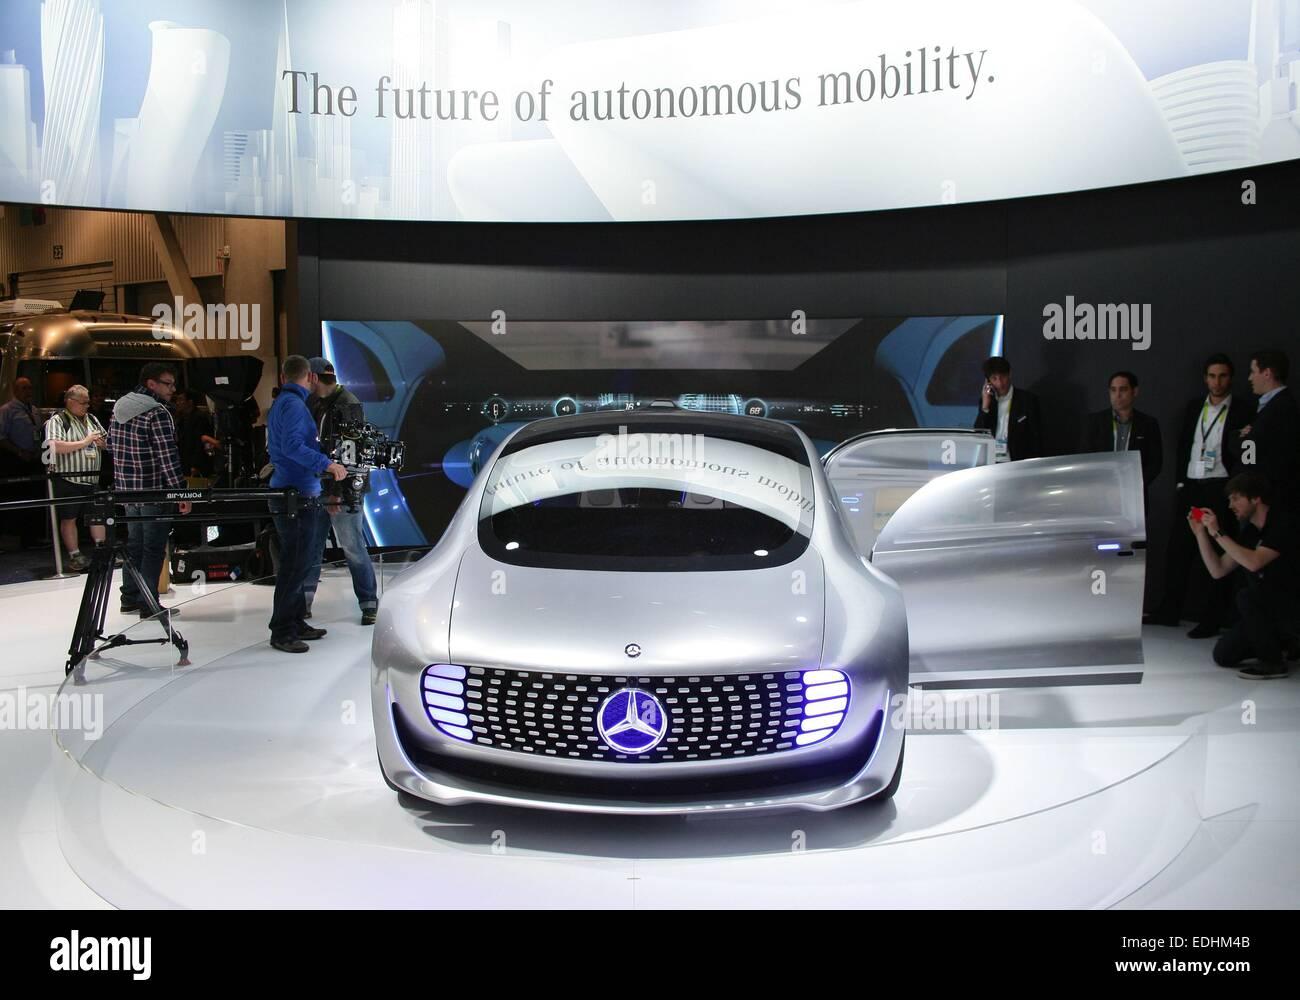 Las Vegas, NV, USA. 6th Jan, 2015. Mercedes-Benz F 015 Self-Driving Luxury Sedan Concept Car in attendance for 2015 - Stock Image